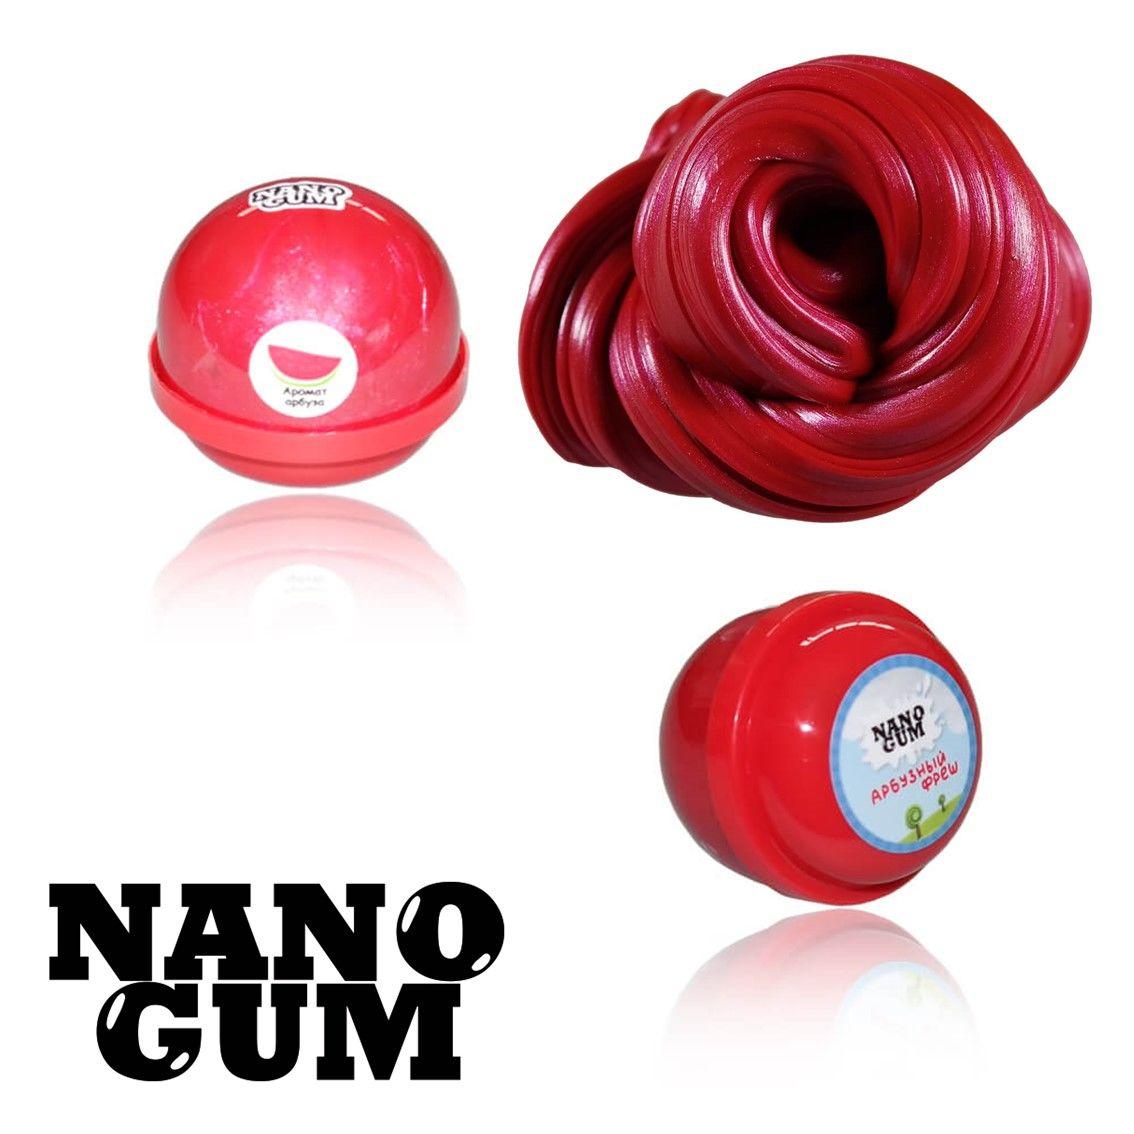 Жвачка для рук Nano gum Арбузный Фреш 25гр.